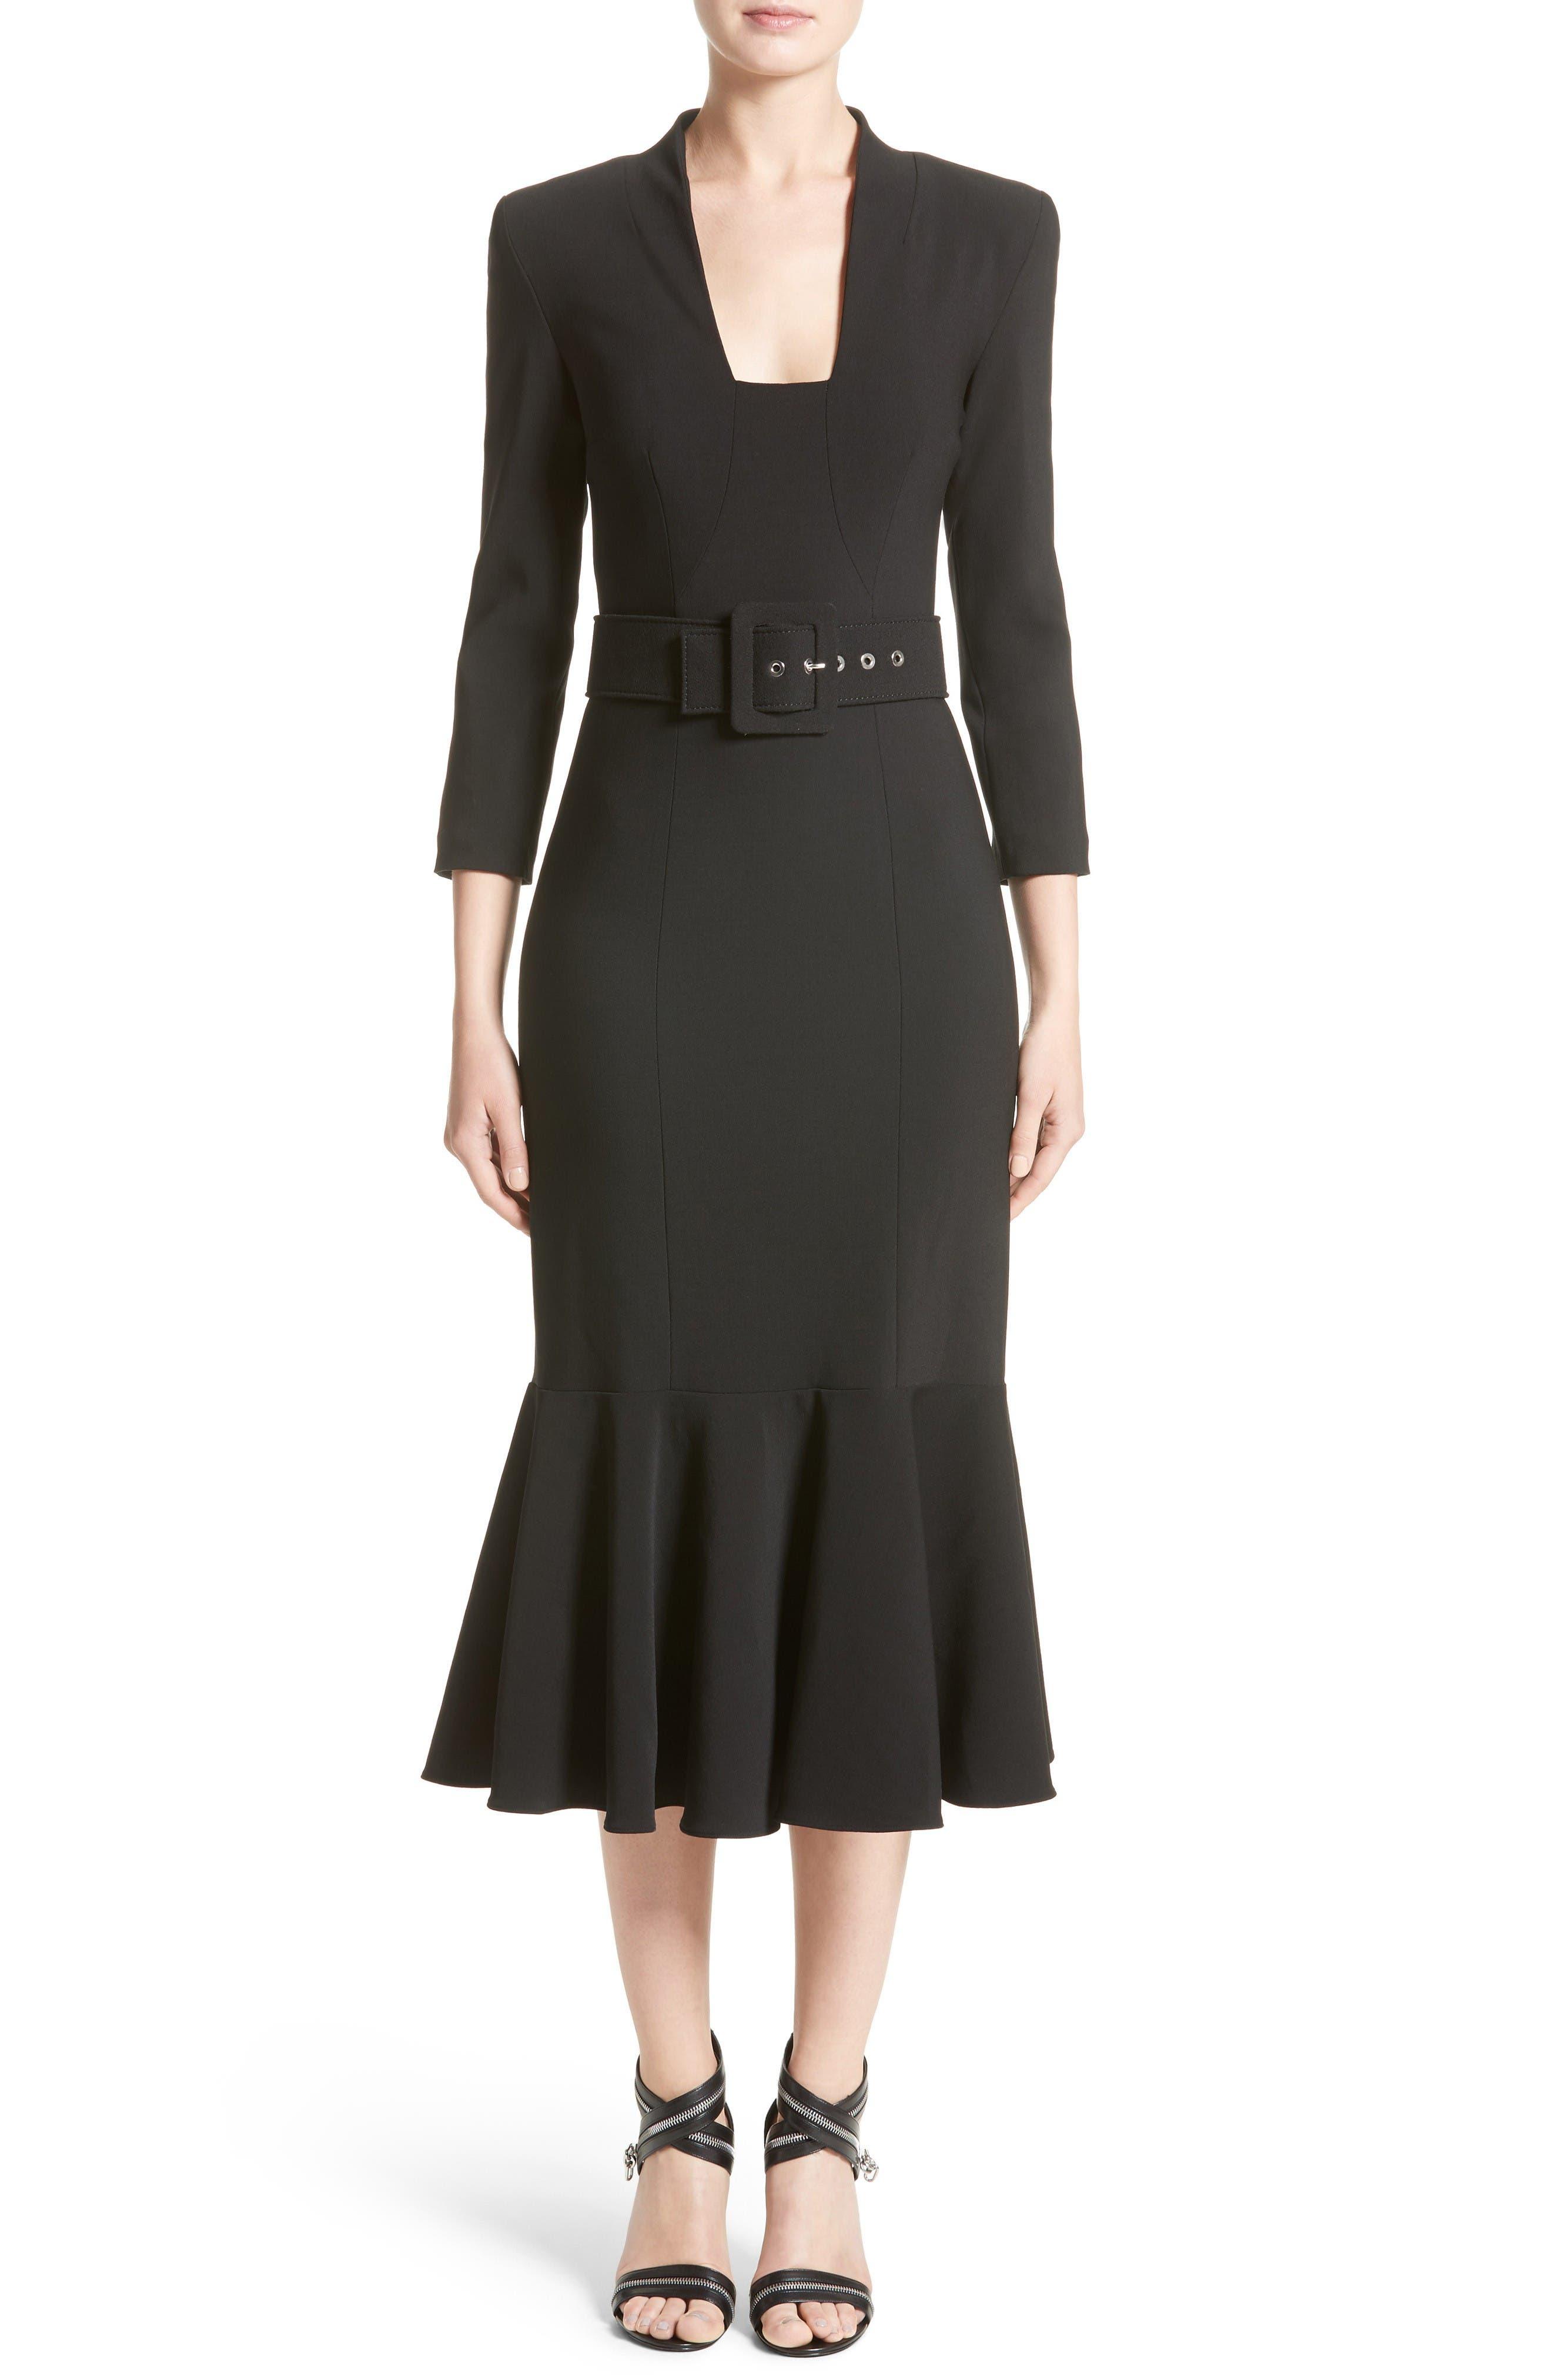 Alternate Image 1 Selected - Michael Kors Stretch Pebble Crepe Bolero Sheath Dress